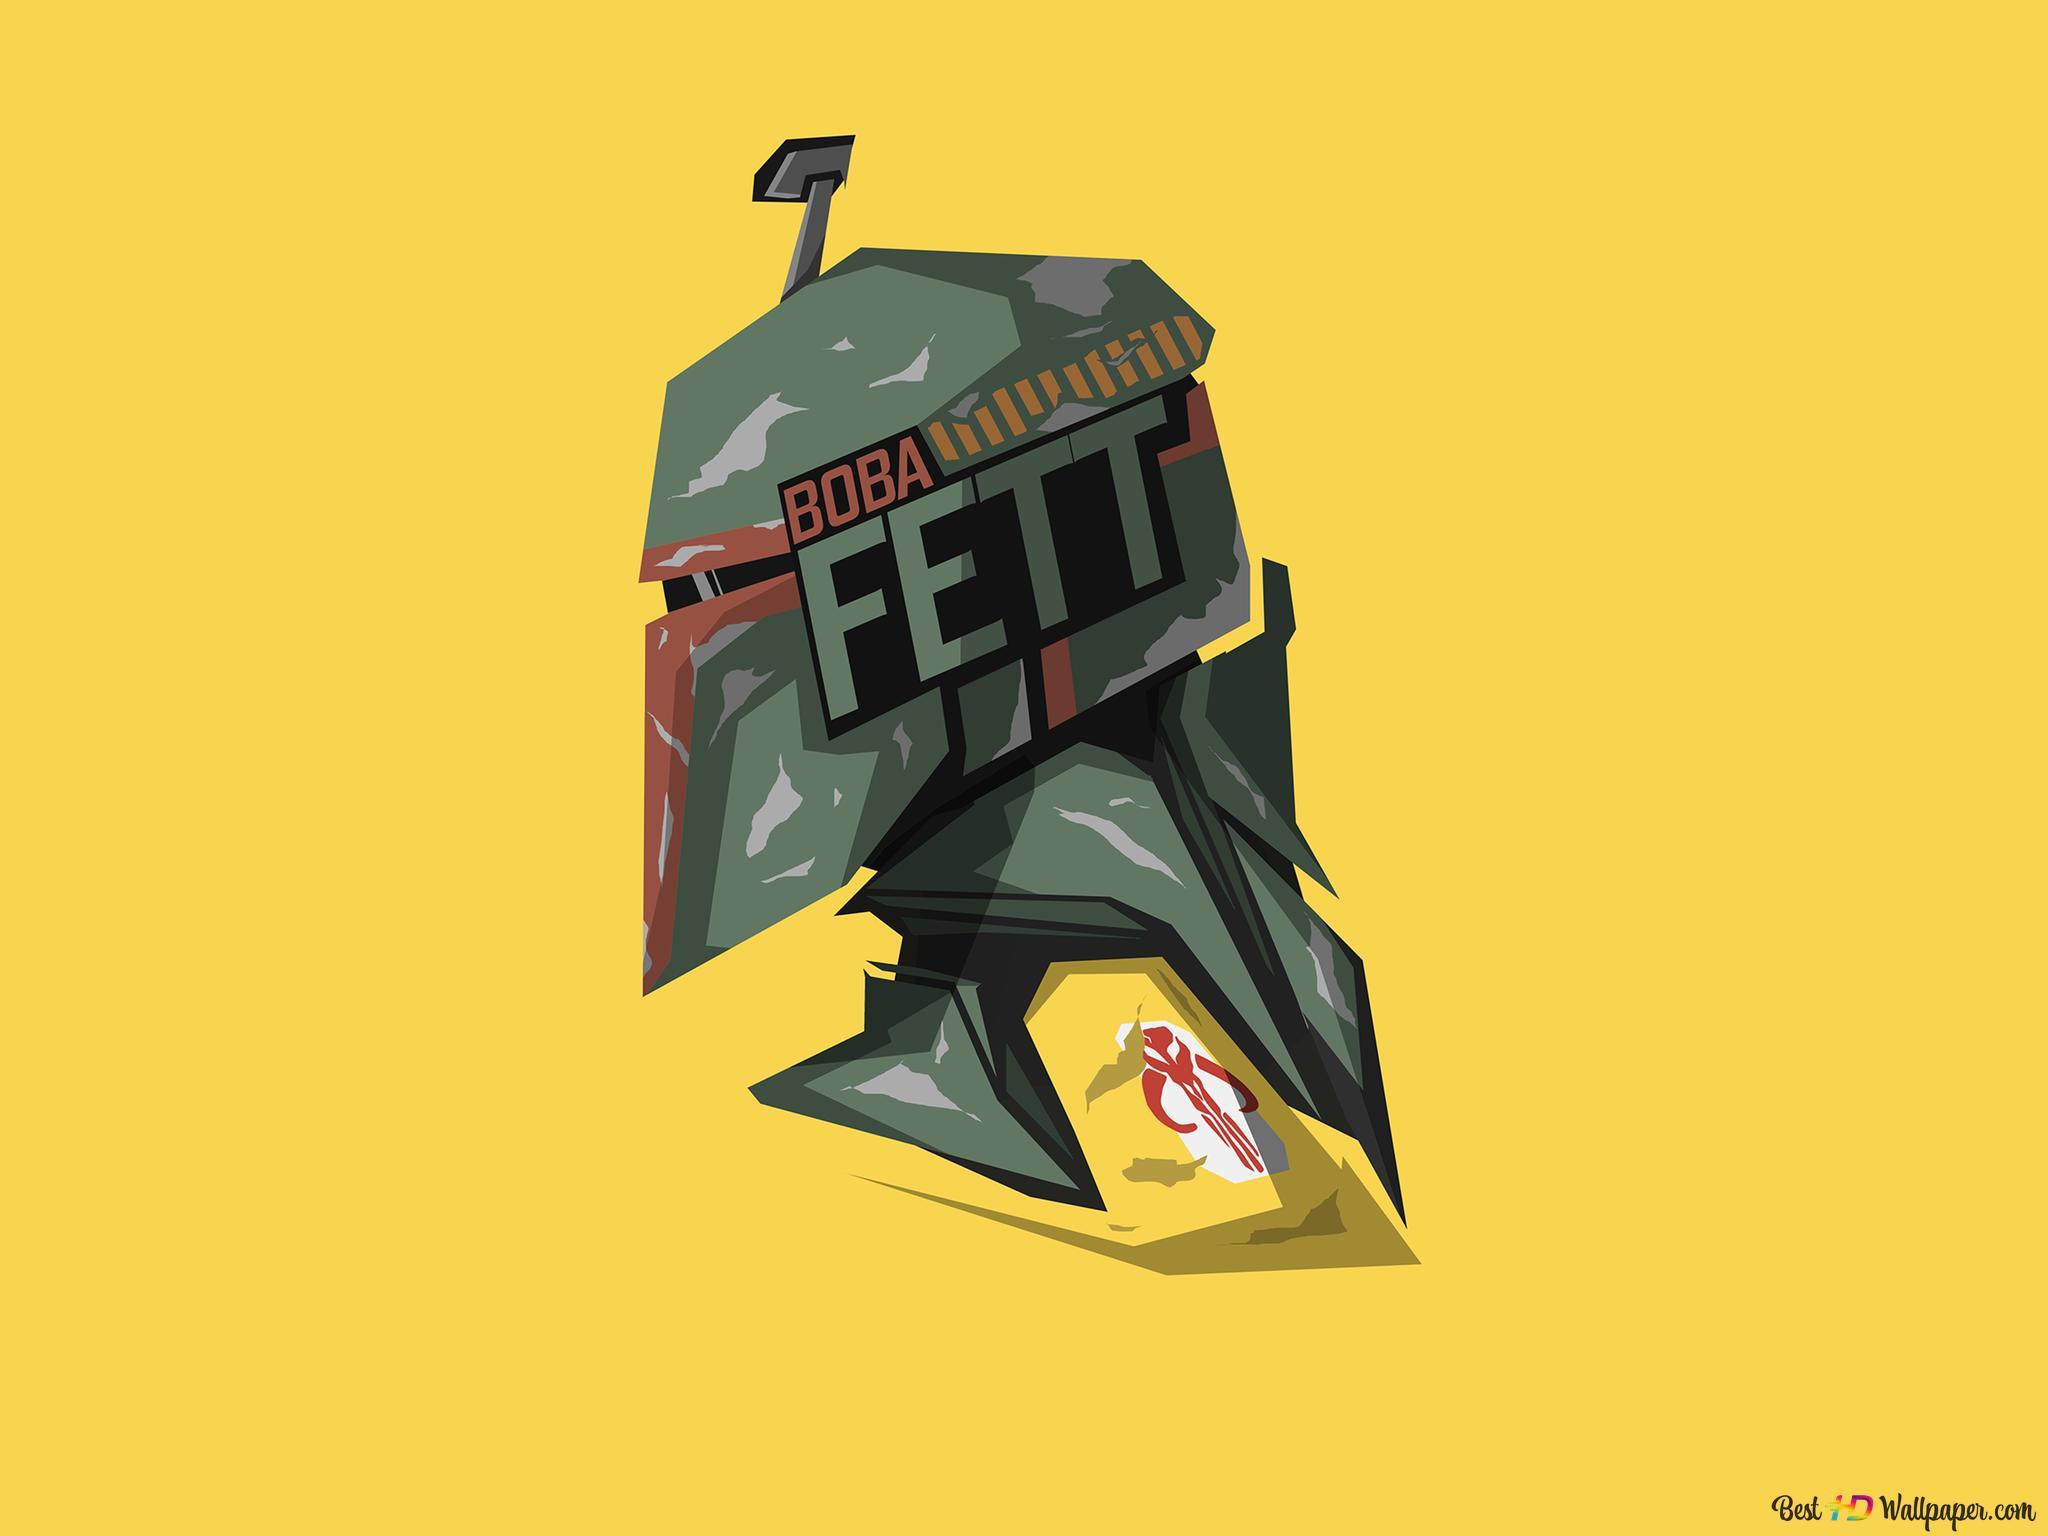 Star Wars Boba Fett Minimalist In Yellow Wallpaper Background Hd Wallpaper Download